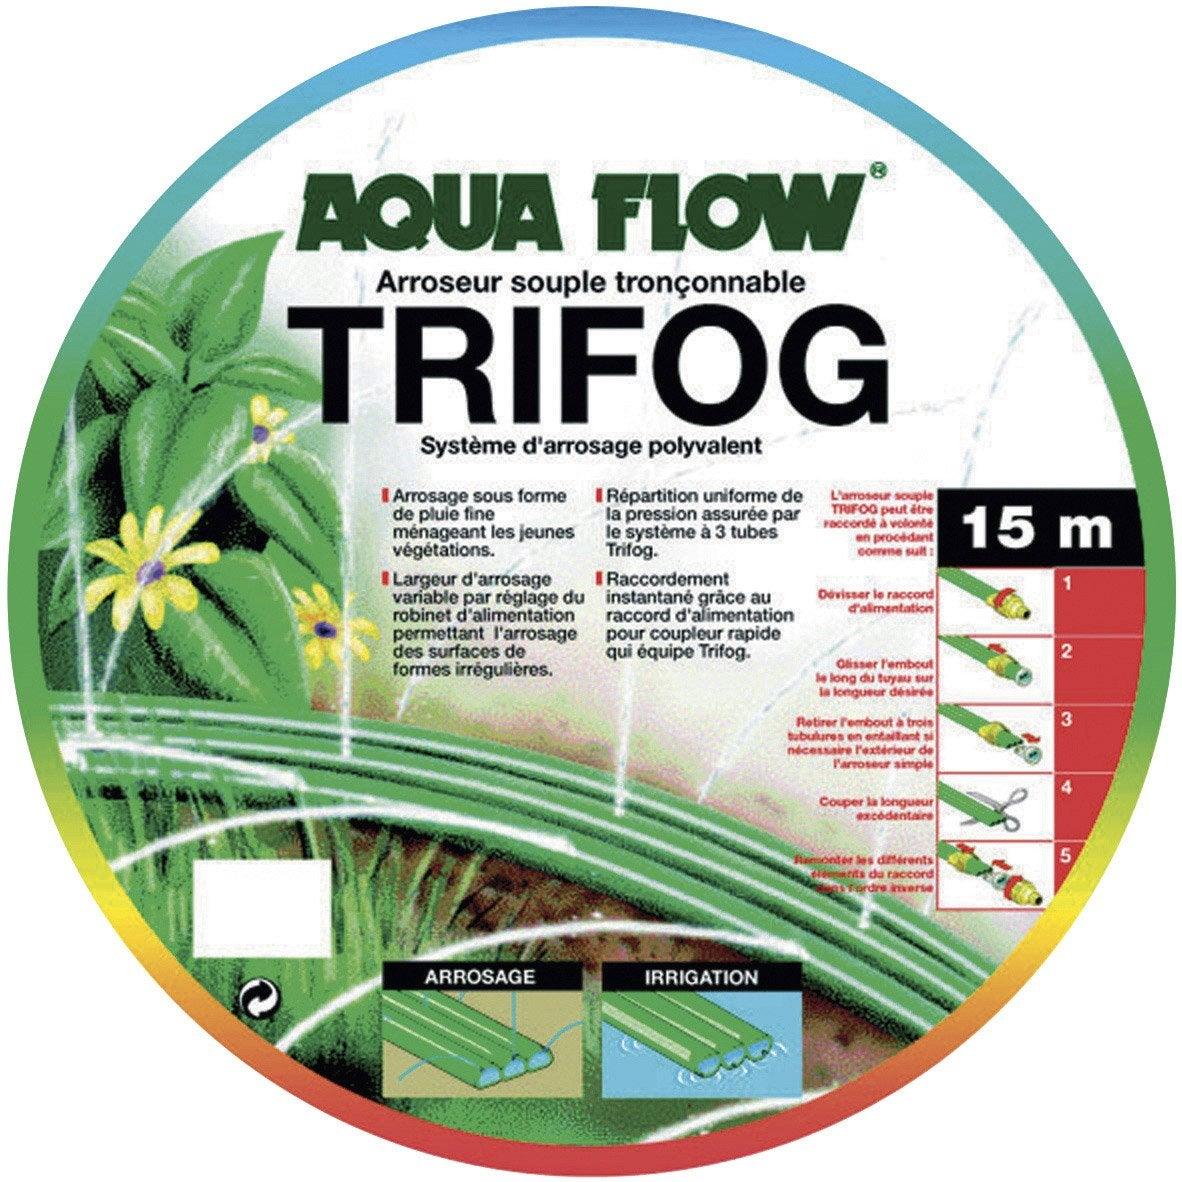 100 Génial Conseils Tuyau Perforé Pour Irrigation